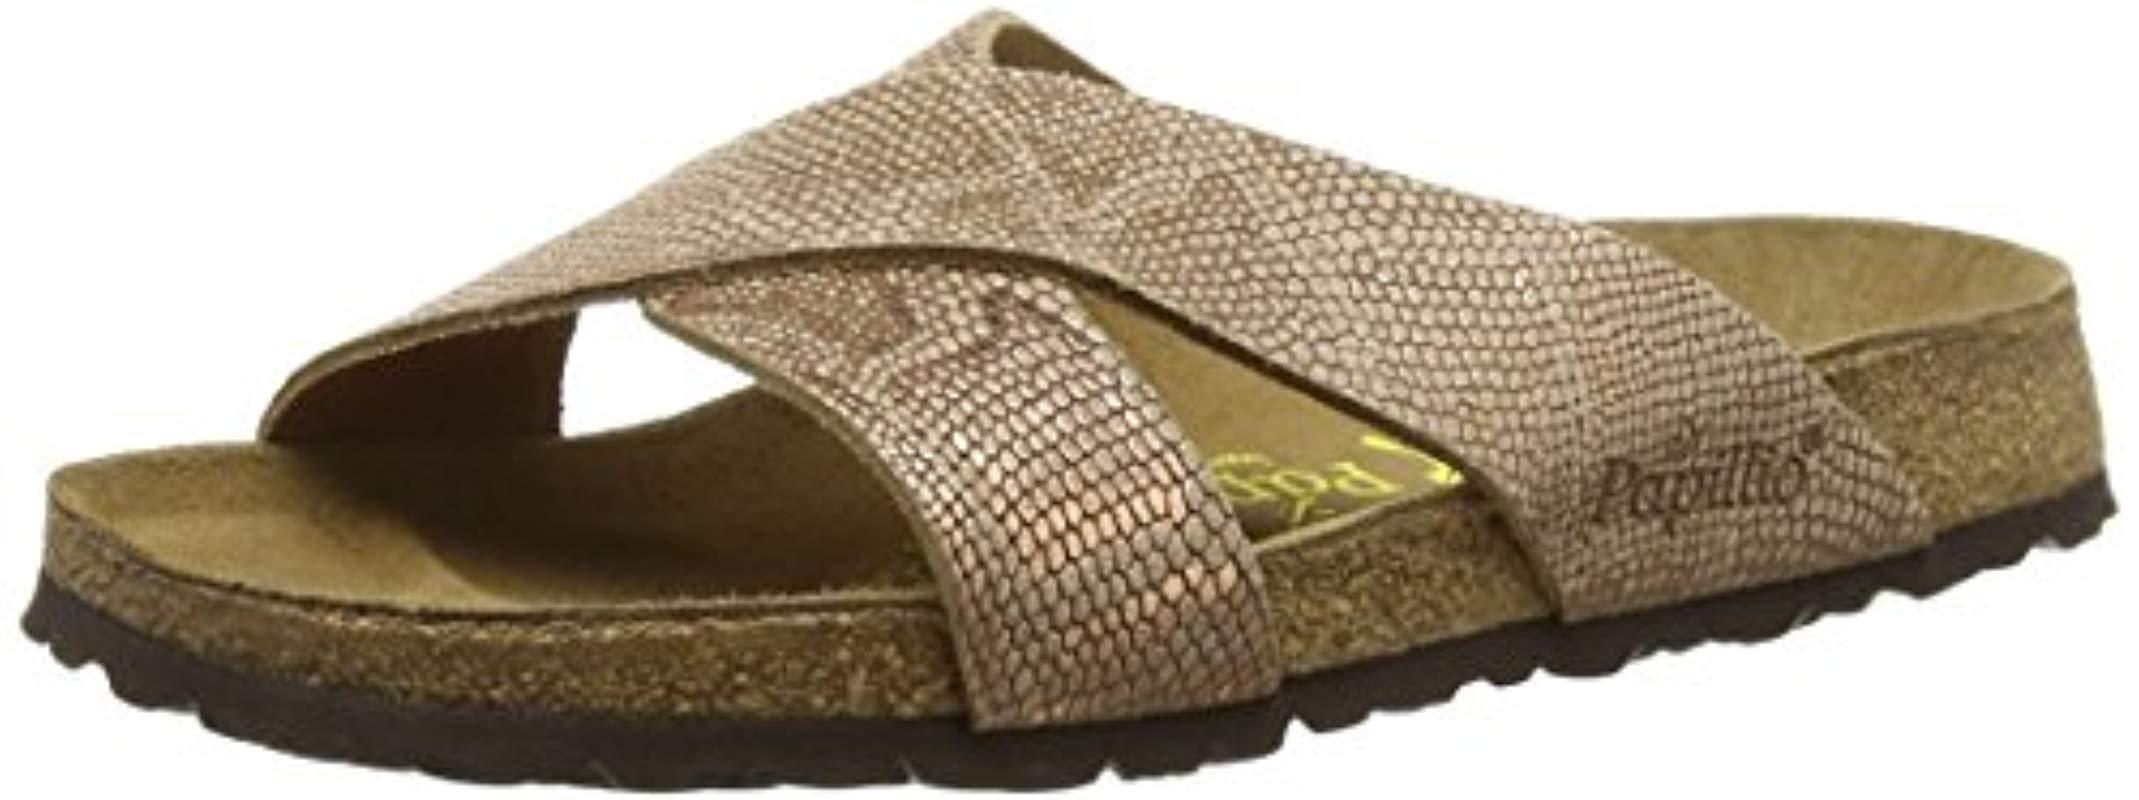 Birkenstock Daytona Leder Heels Sandals in Brown - Lyst 68727b86019